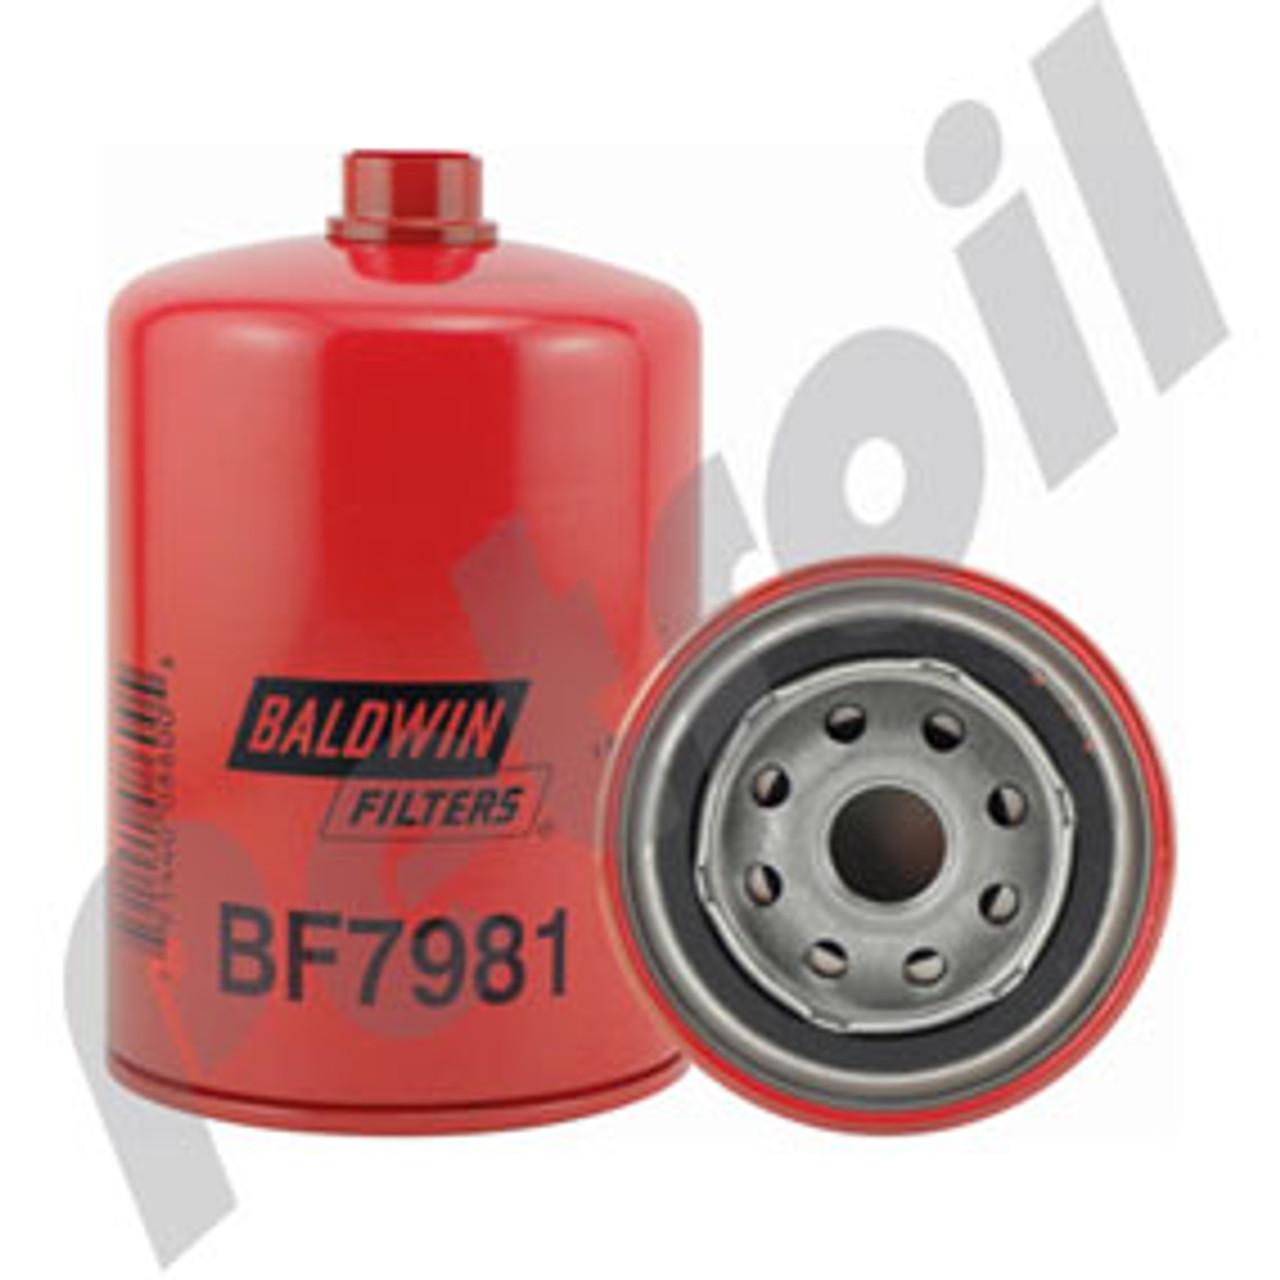 BF7981 Baldwin Fuel Filter Spin On w/port Sensor (M14x2) Tata ... on baldwin hardware, baldwin diesel, baldwin interchange fleet quick cross, baldwin seahawks 29, baldwin lamps, baldwin amplifiers, baldwin cross reference chart,